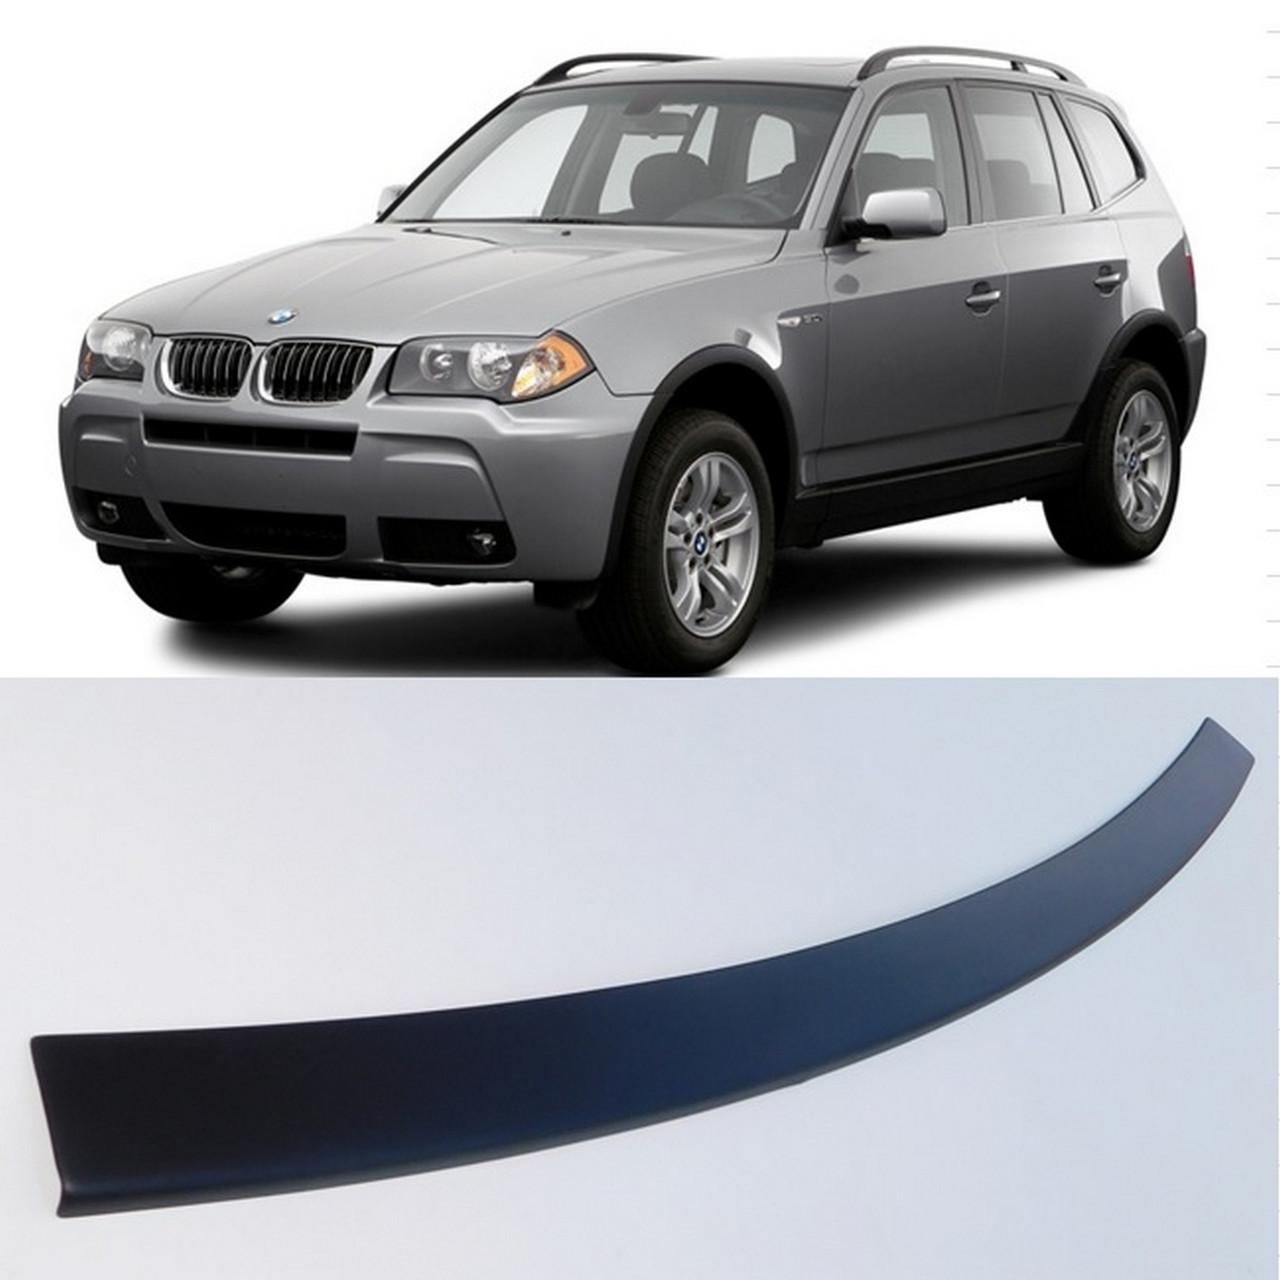 Пластиковая защитная накладка на задний бампер для BMW X3 E83 2006-2010